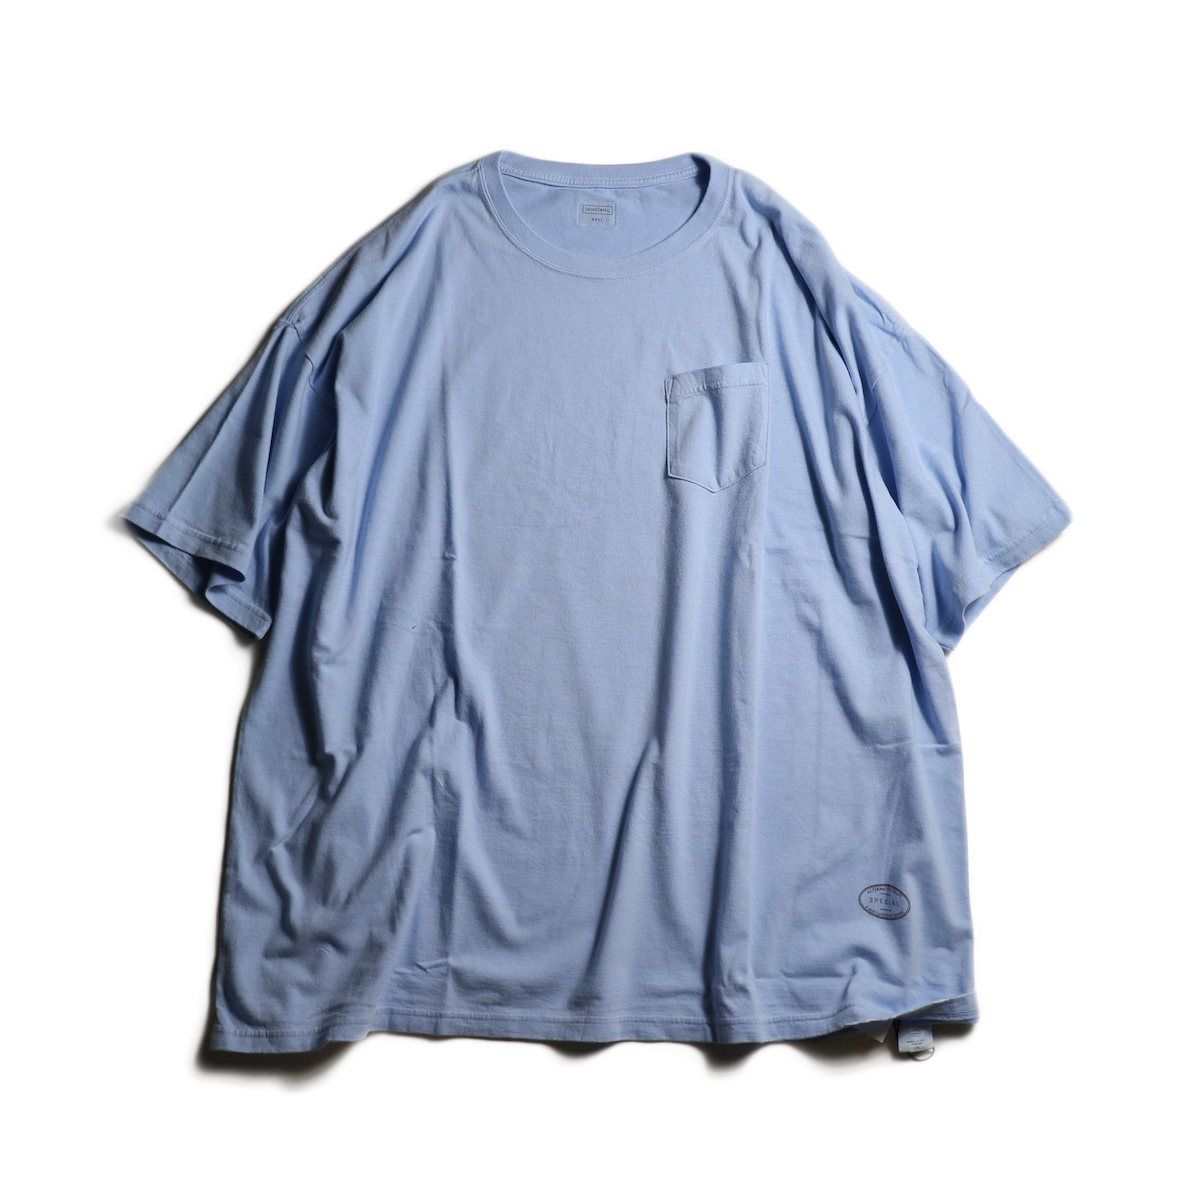 TANGTANG / POCKET (XXXL) (Blue)